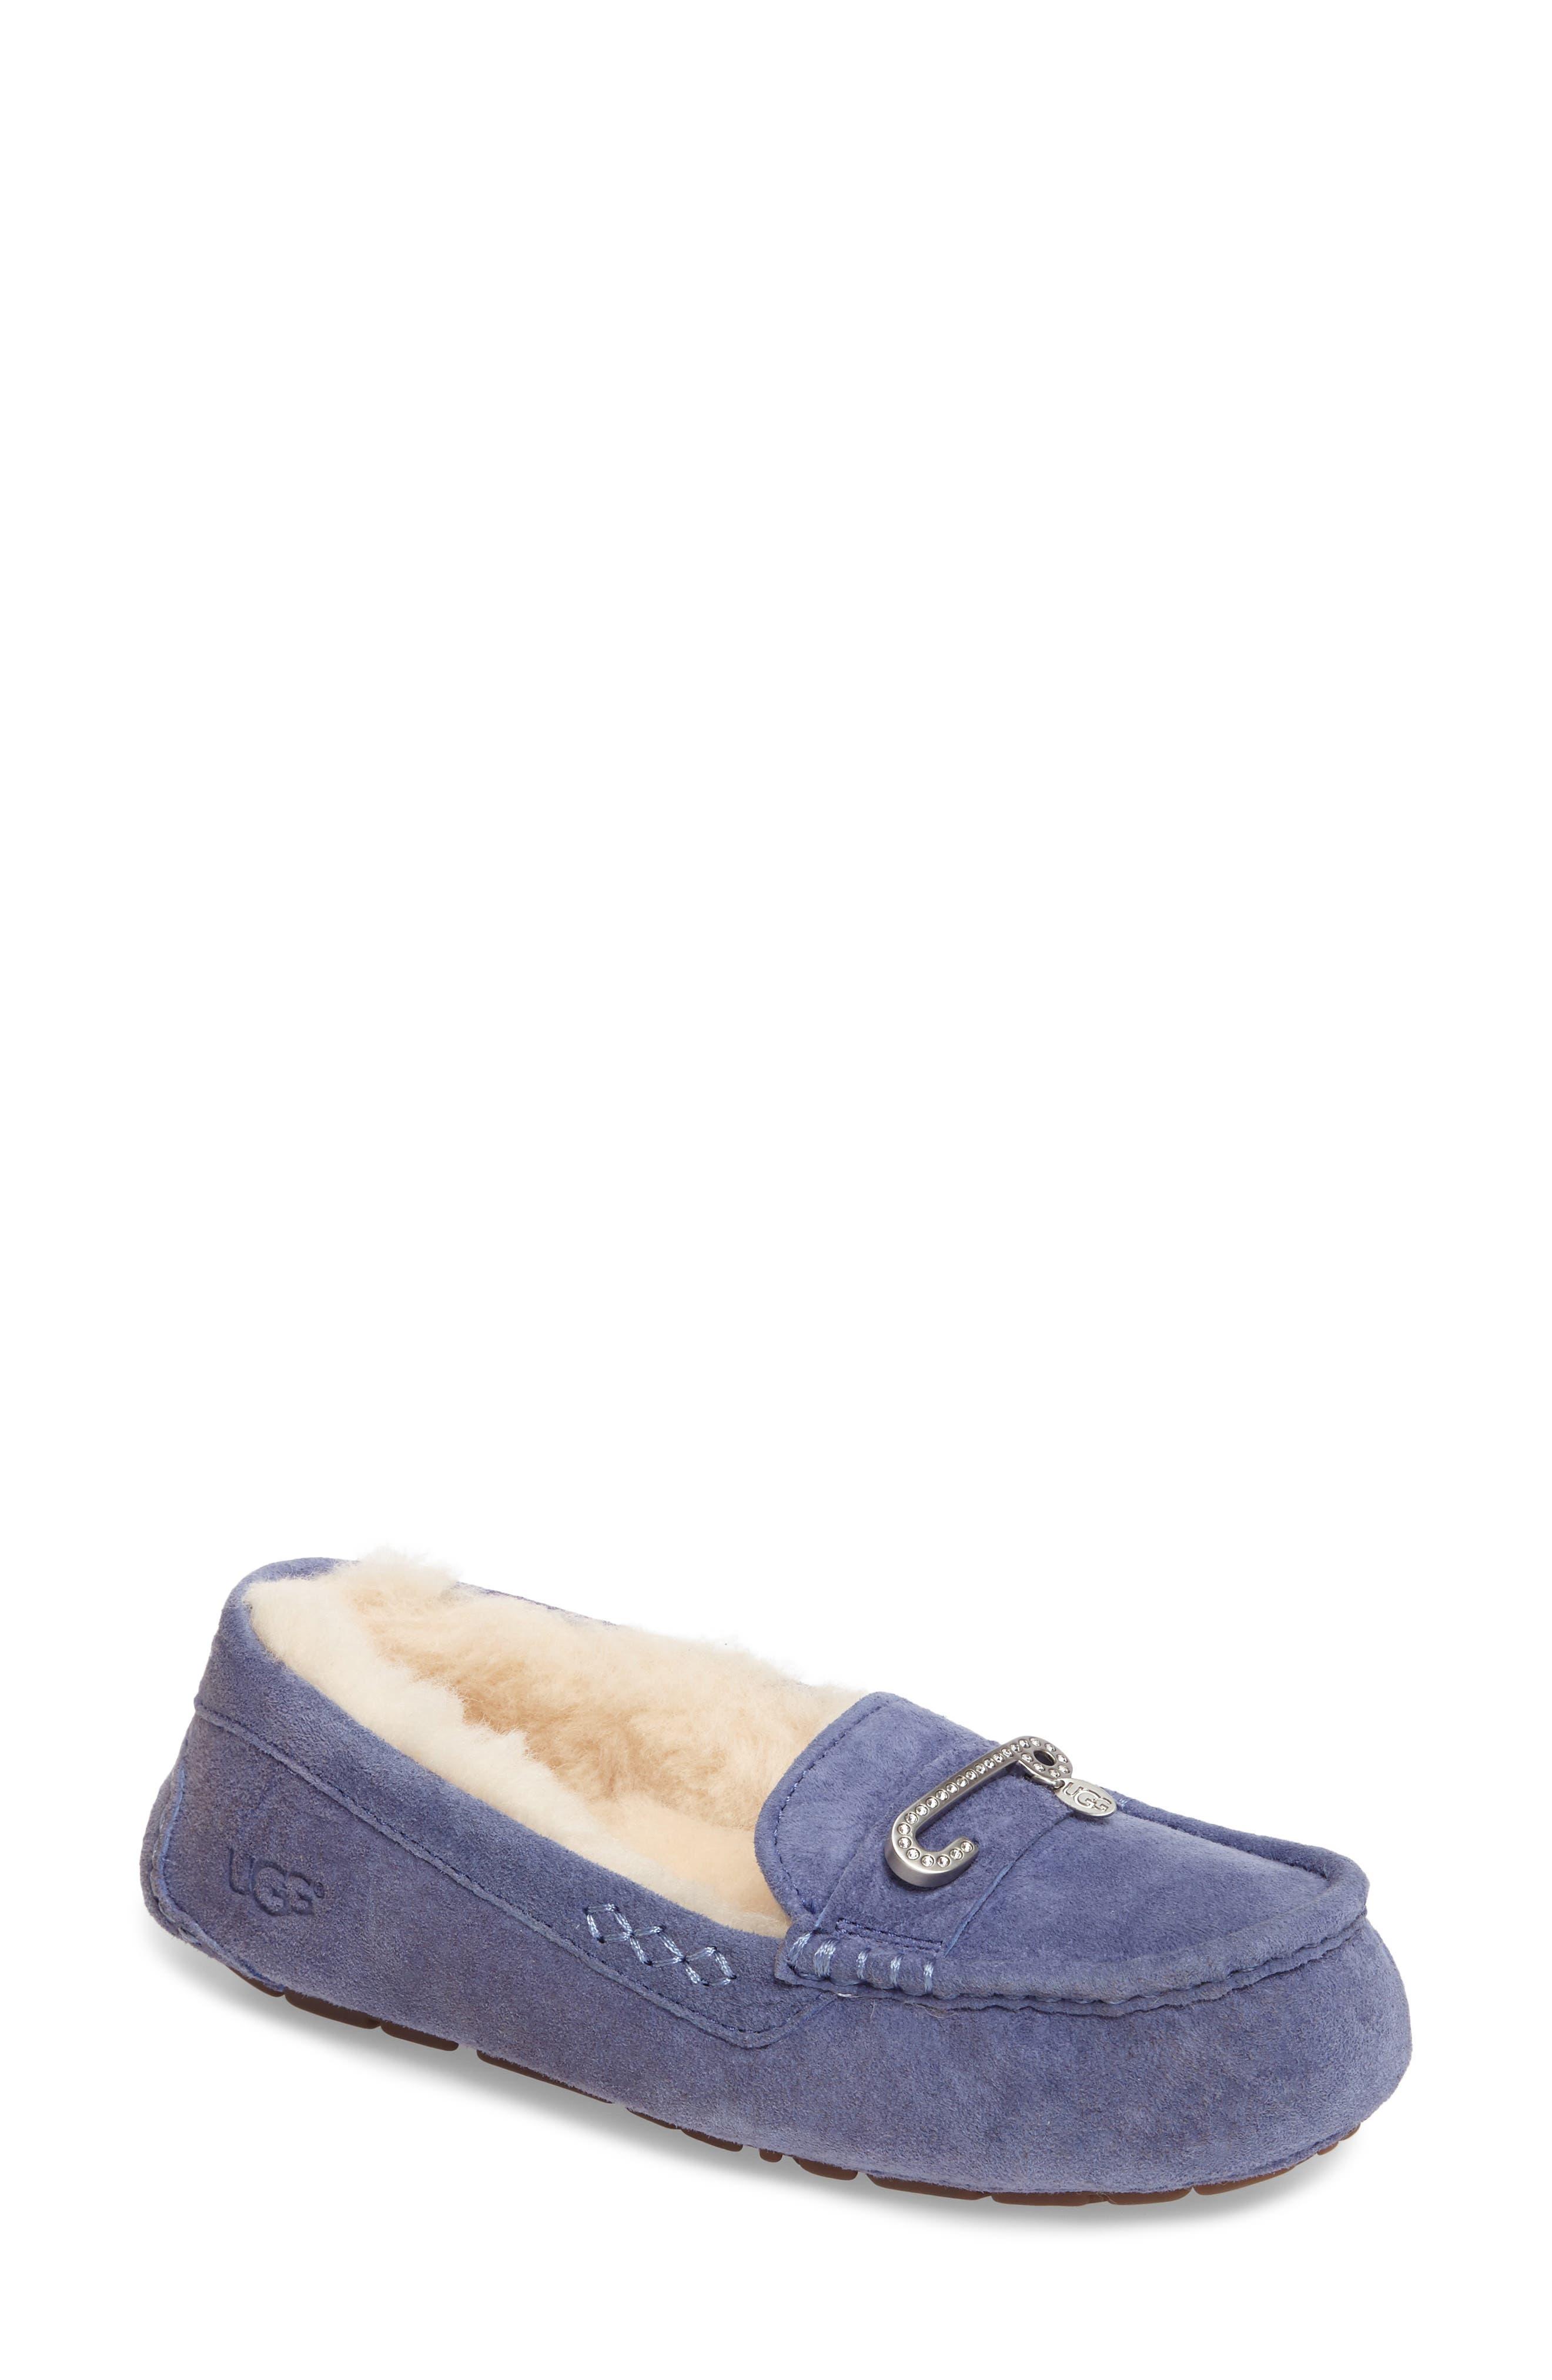 Alternate Image 1 Selected - UGG® Florencia Water Resistant Silkee™ Suede Slipper (Women)